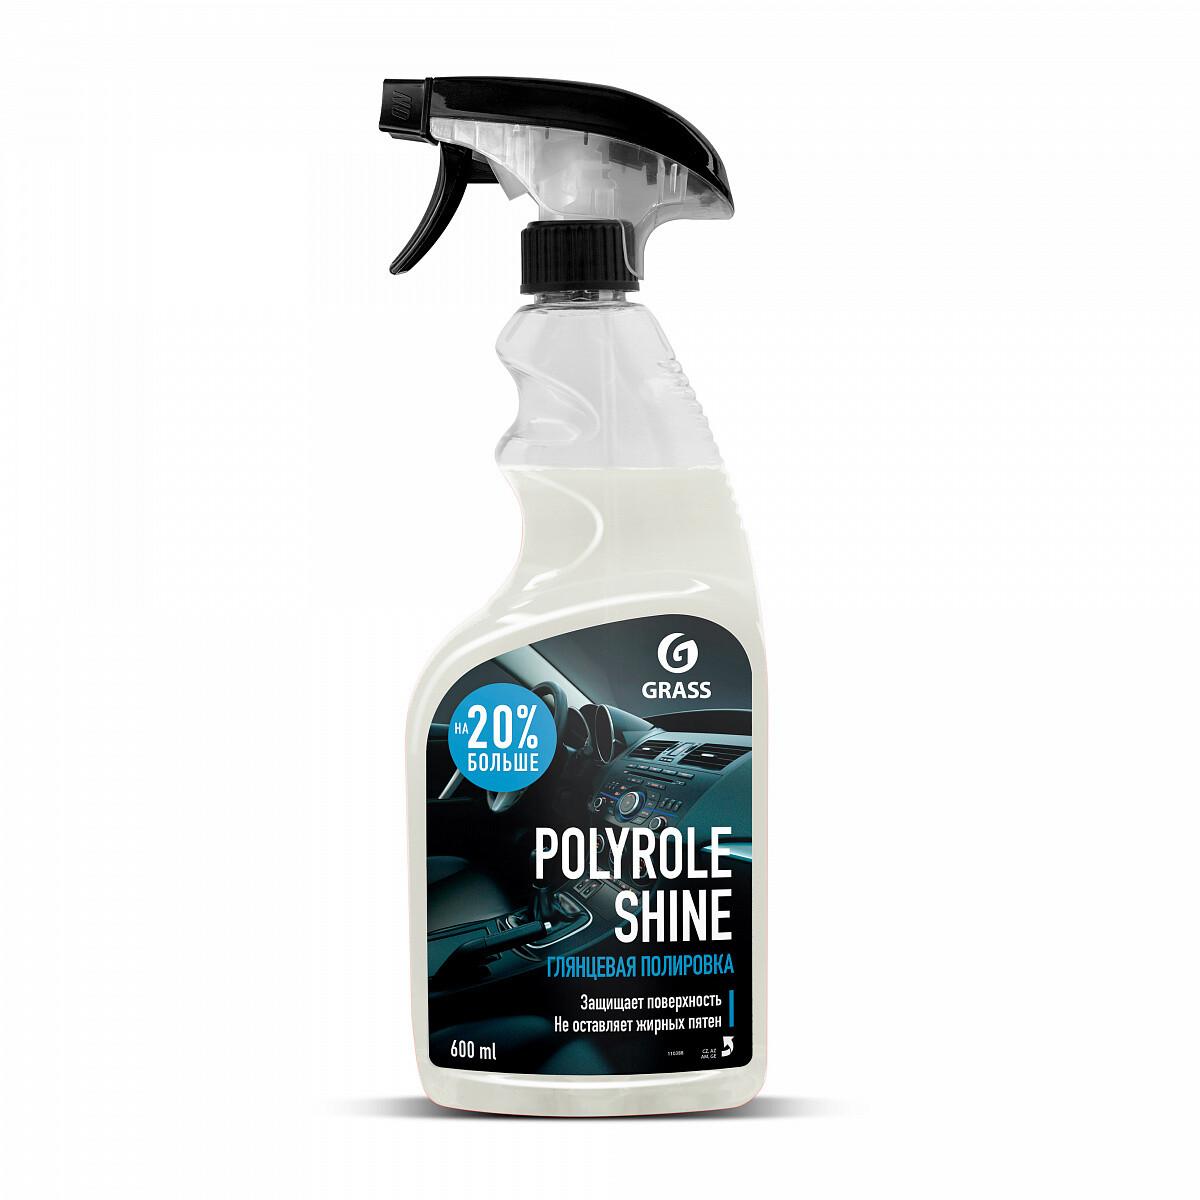 "Глянцевый полироль для кожи, резины и пластика ""Polyrole Shine"" (флакон 600 мл)"